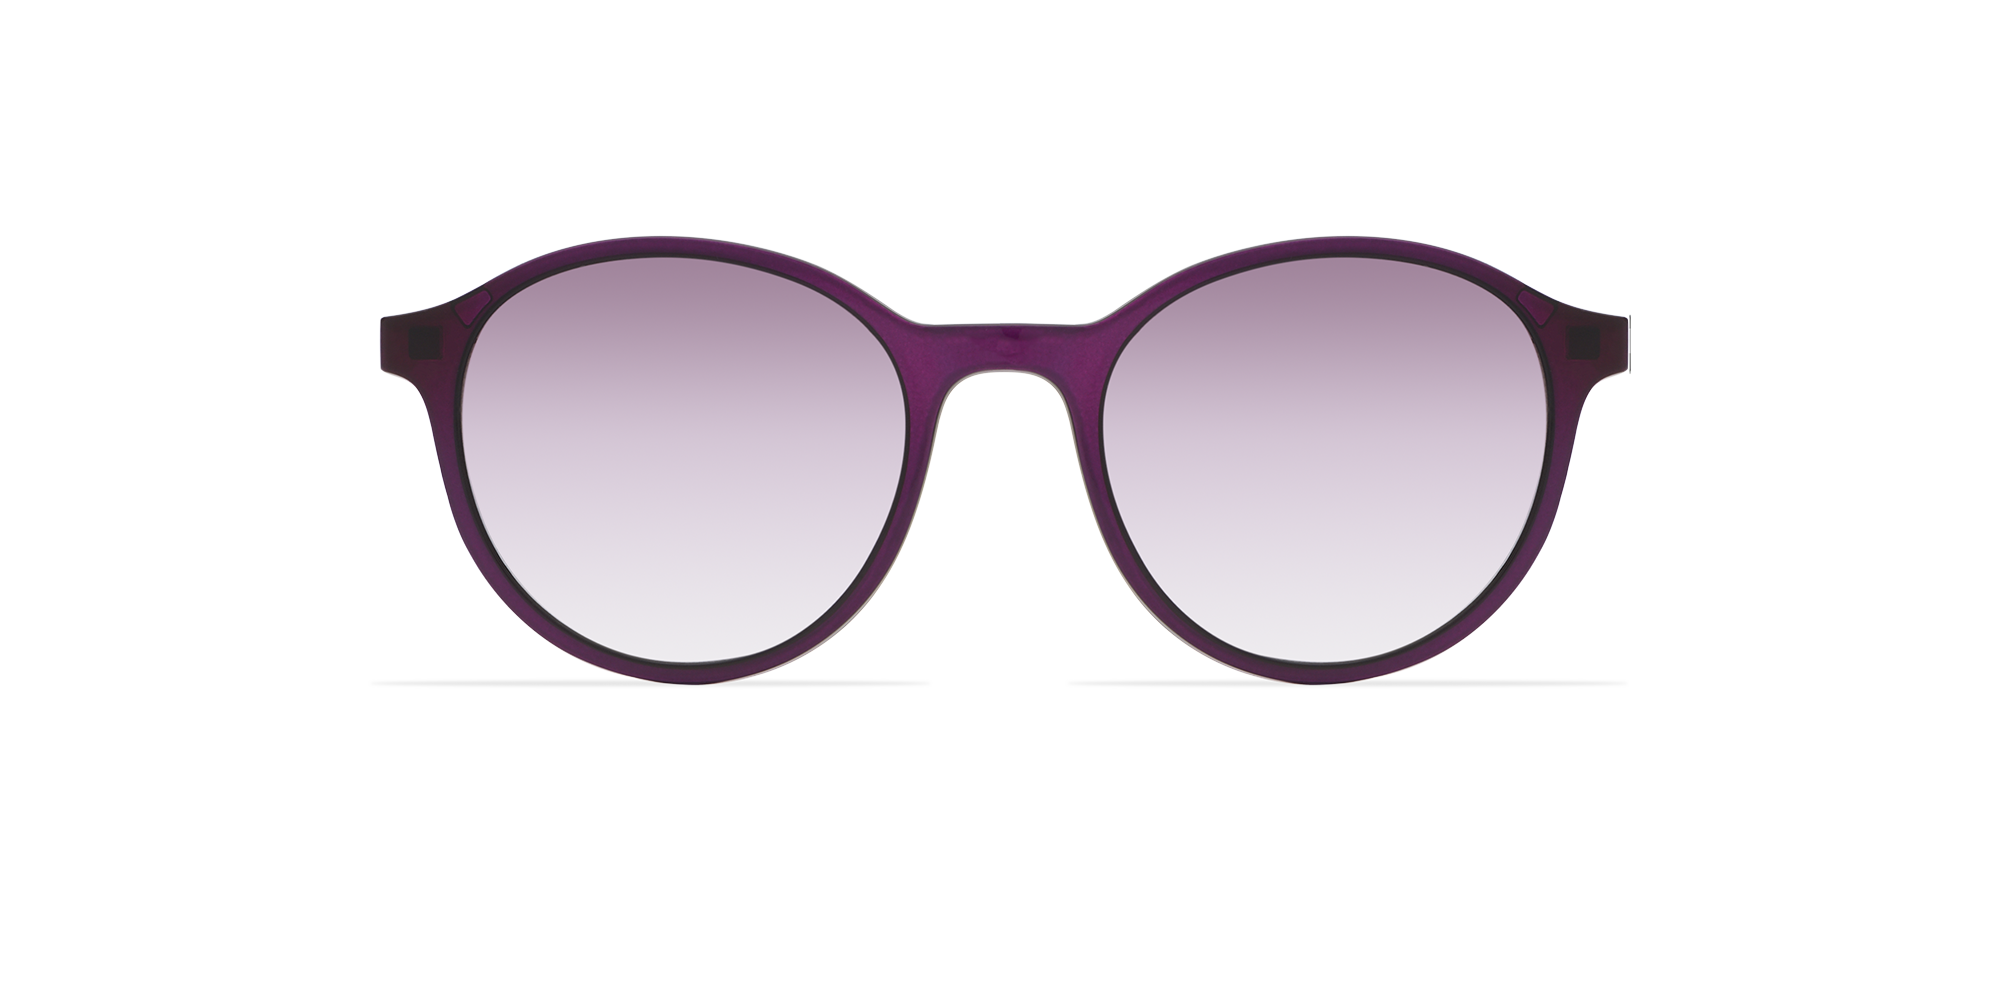 afflelou/france/products/smart_clip/clips_glasses/TMK37SUPU014919.png